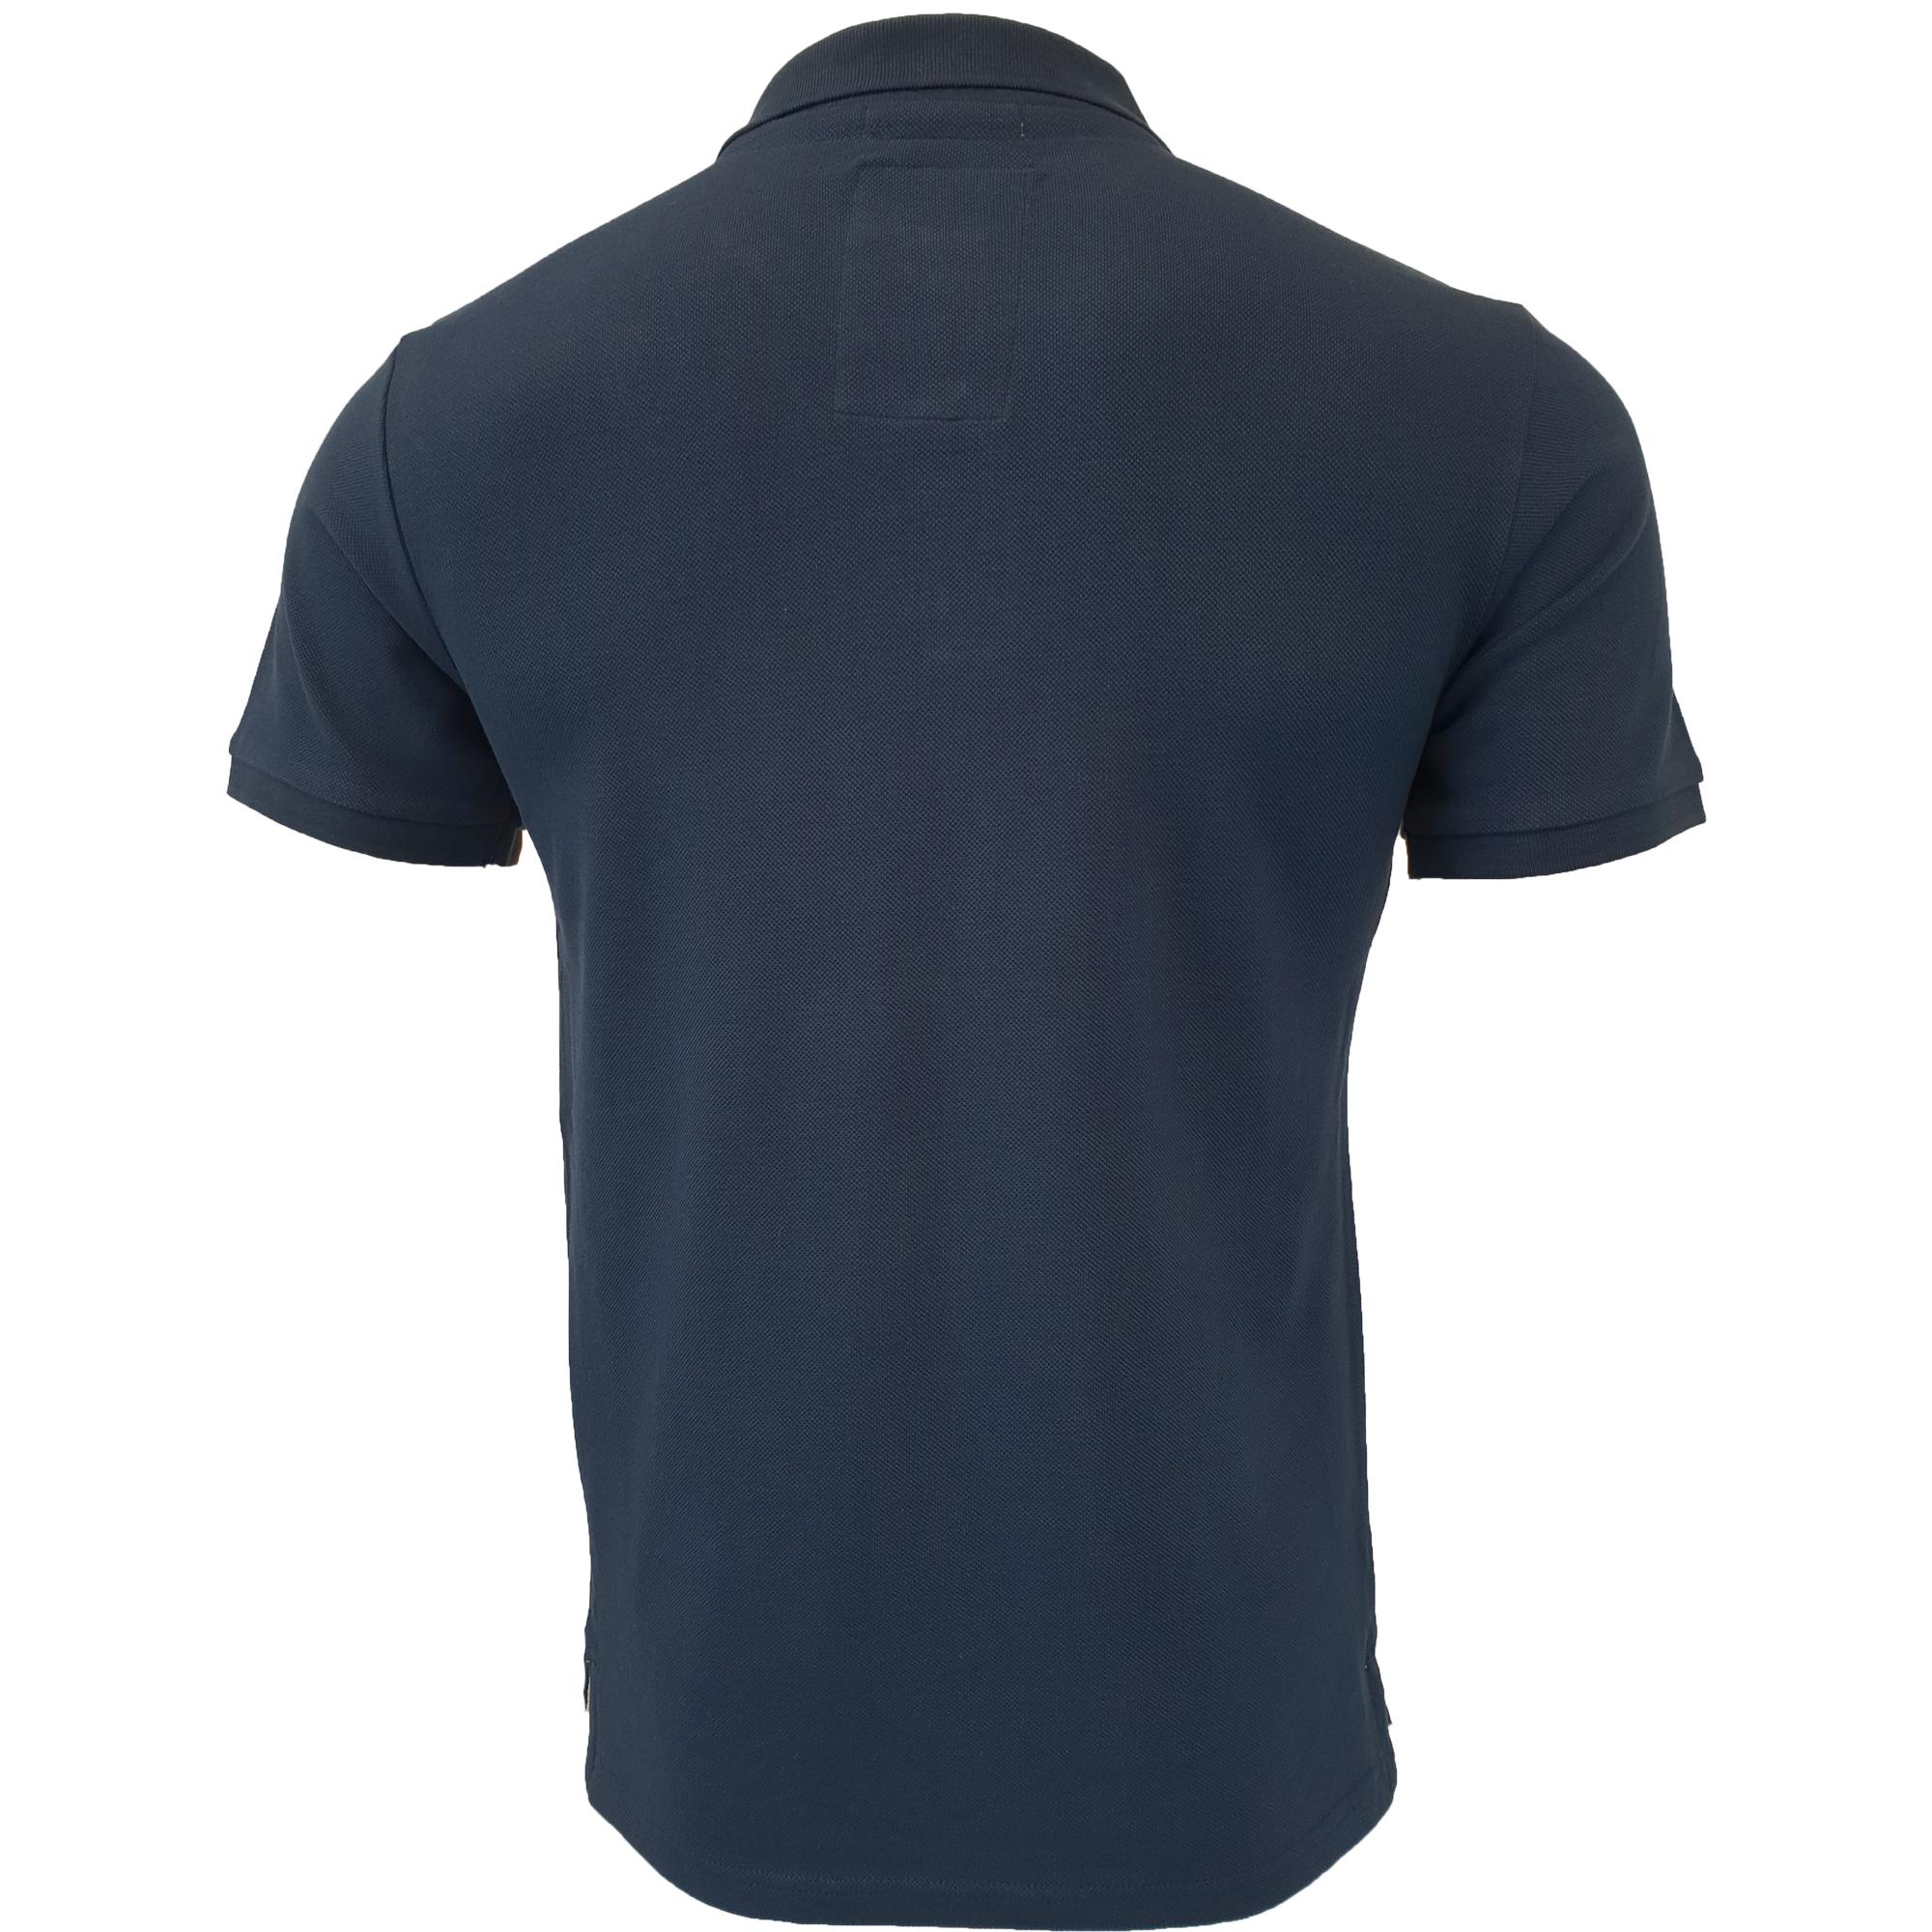 Mens-Pique-Polo-T-Shirt-Tokyo-Laundry-Florenzi-Short-Sleeved-Top-Casual-Summer thumbnail 12